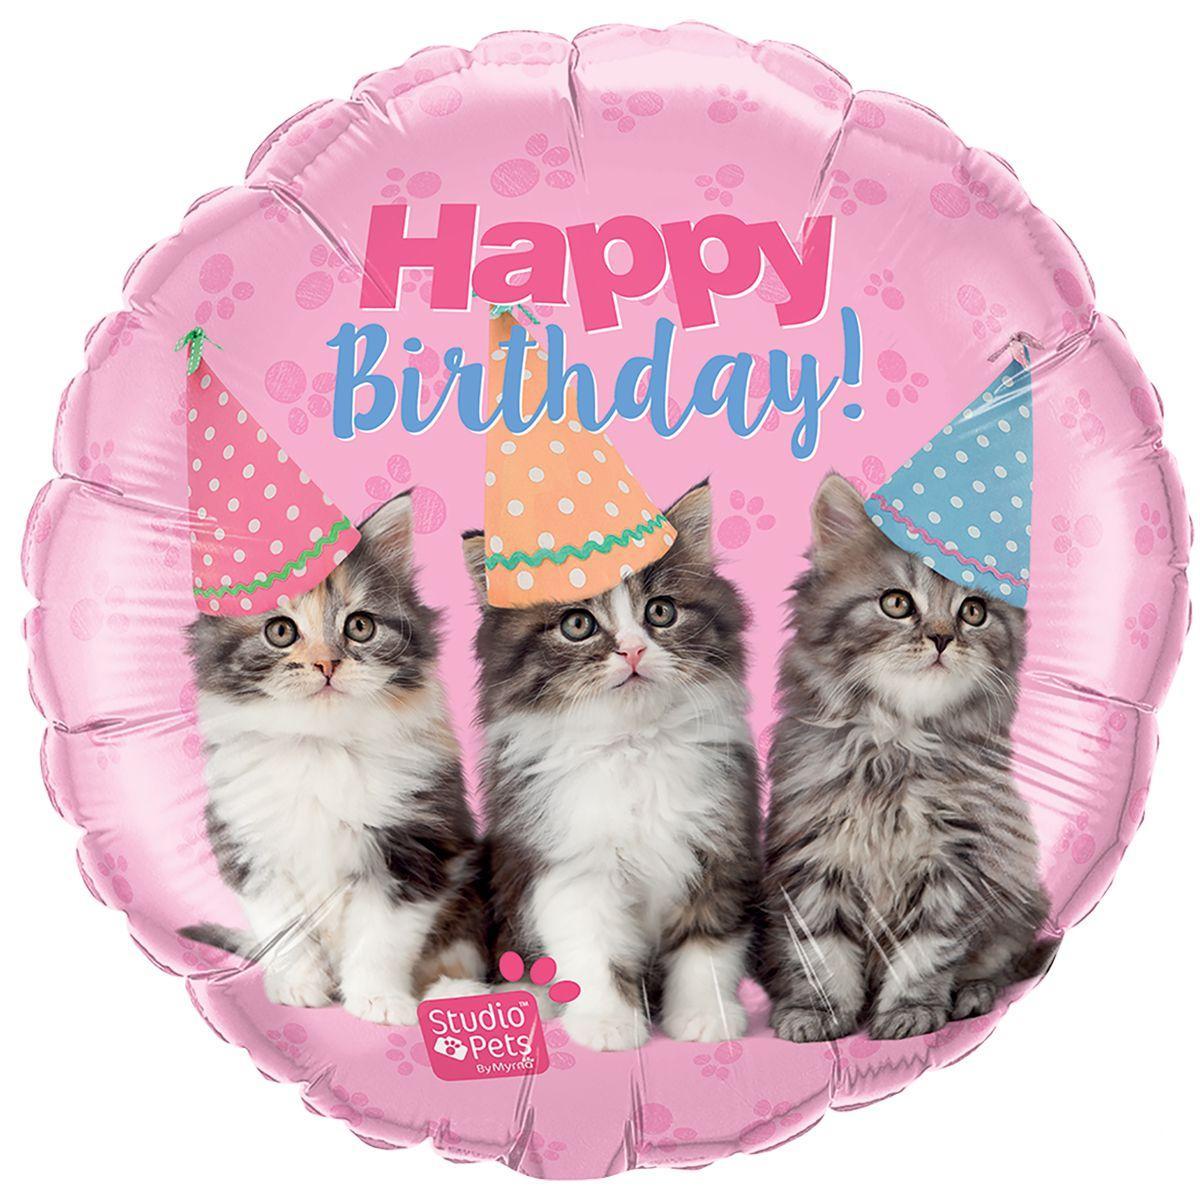 "Фол шар Qualatex 18"" Круг Розовый Котята в колпачках Happy Birthday (Квалатекс)"